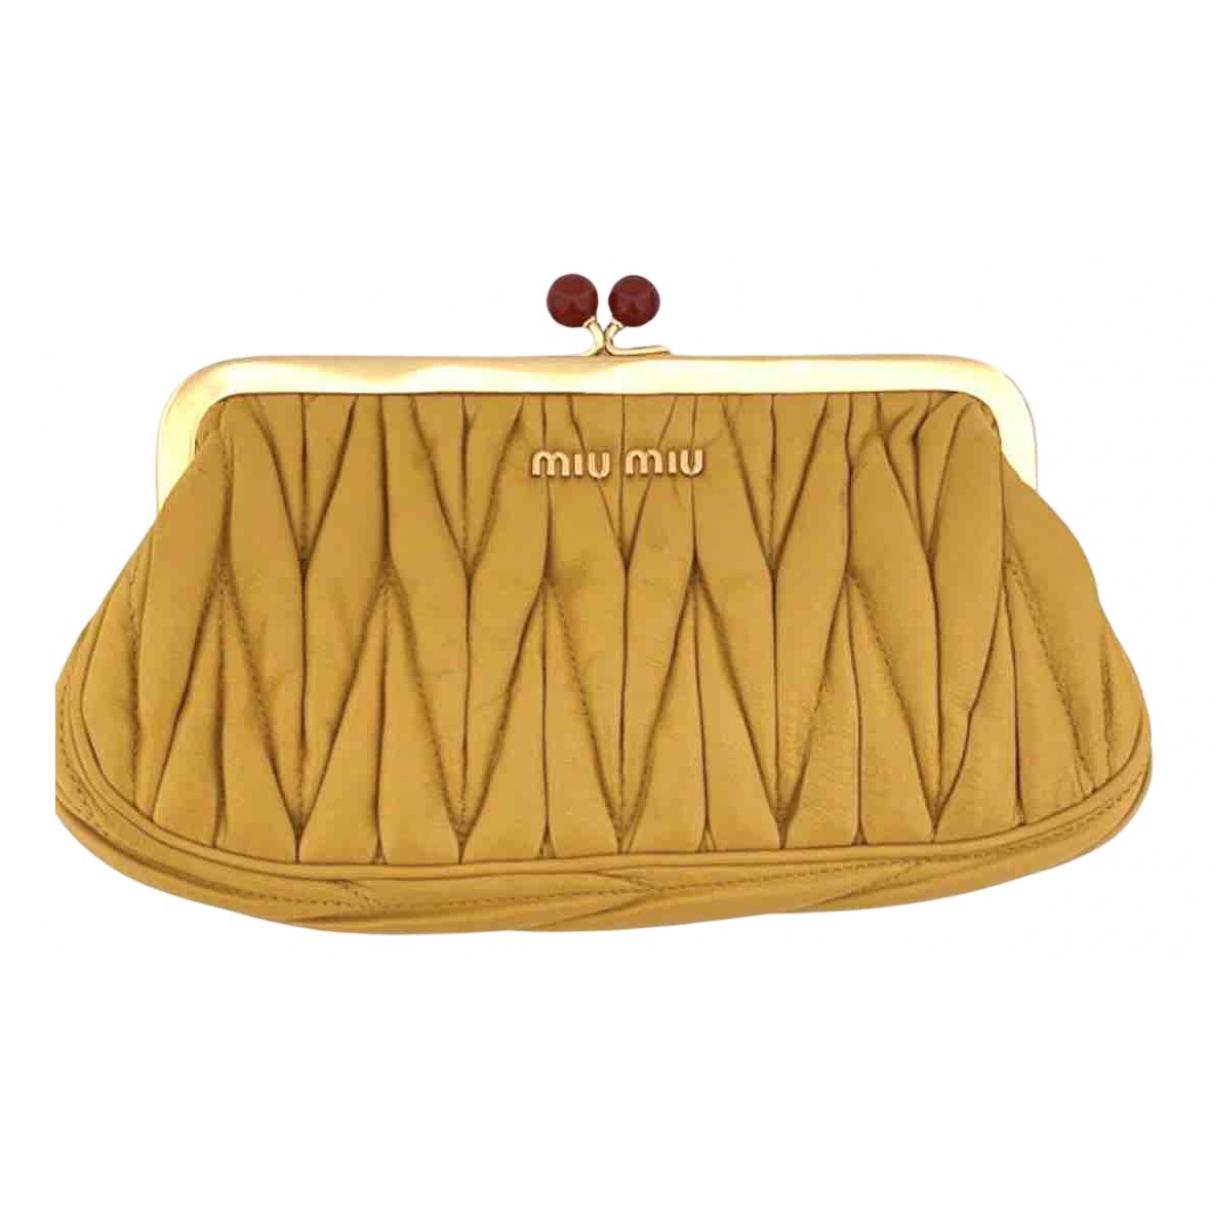 Miu Miu - Pochette Matelasse pour femme en cuir - jaune